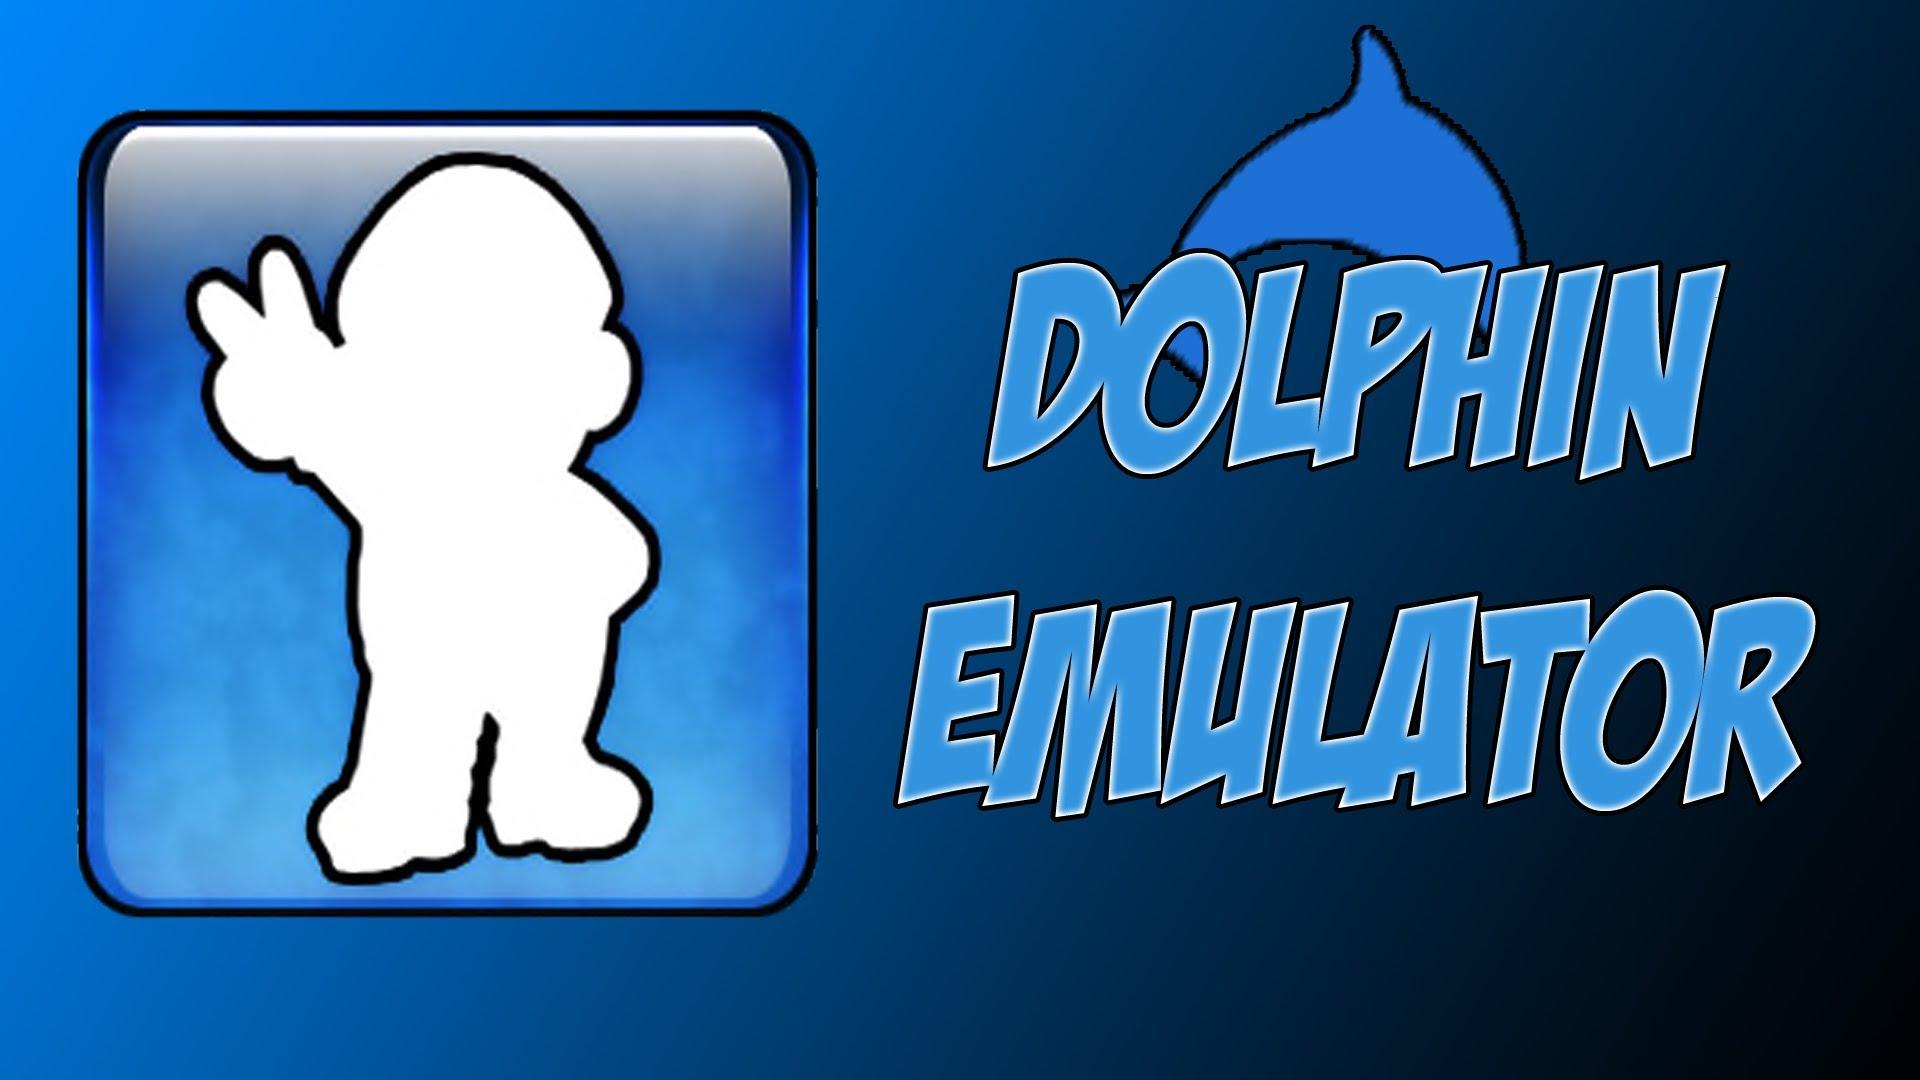 The Dolphin Emulator s...